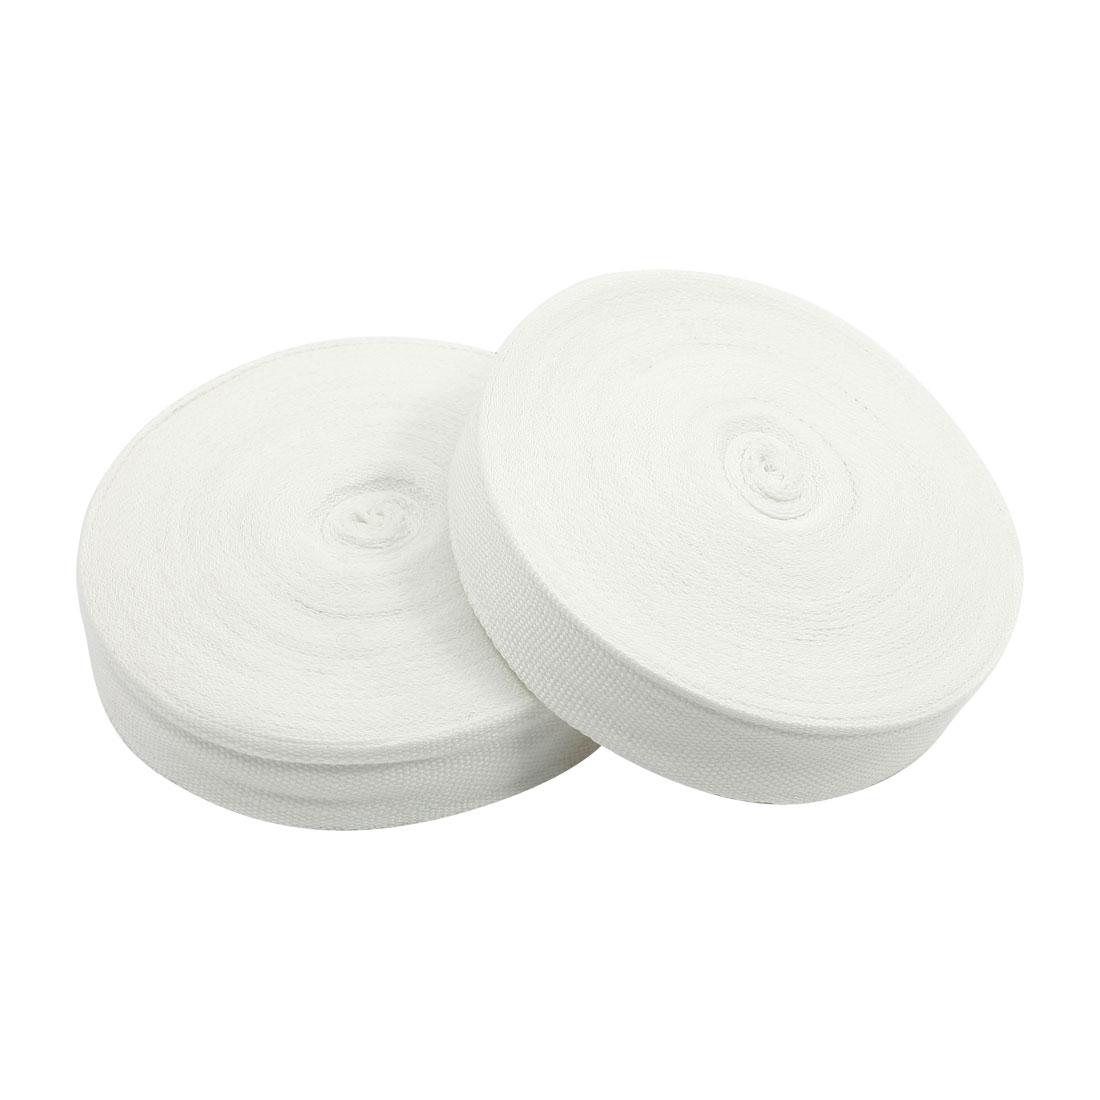 2pcs 20mmx0.25mm Insulating Tape Kit White